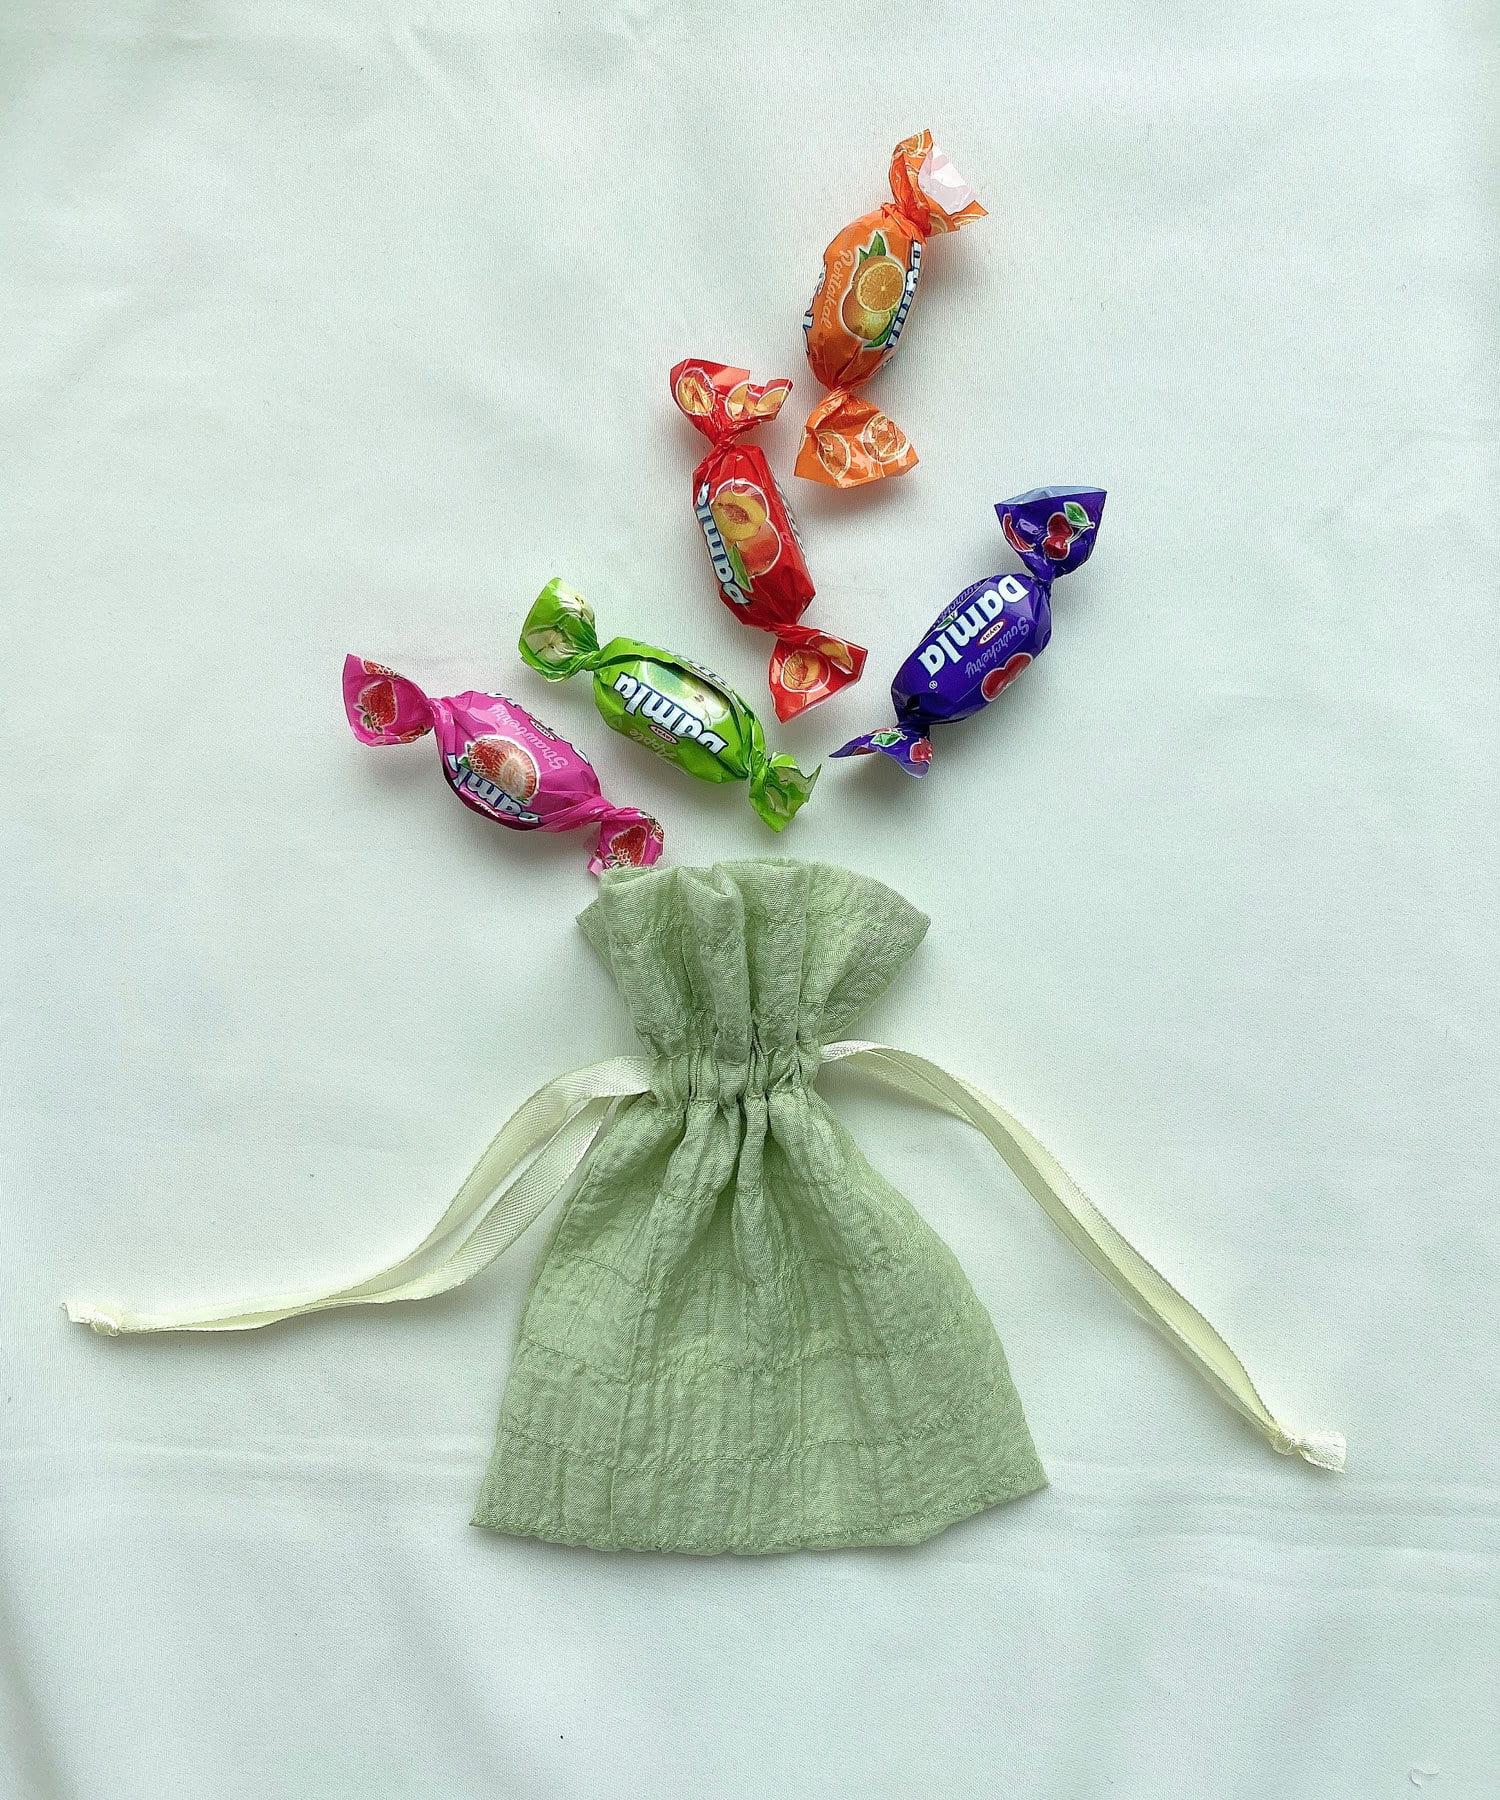 Lattice(ラティス) レディース シャーリング巾着ポーチS イエロー